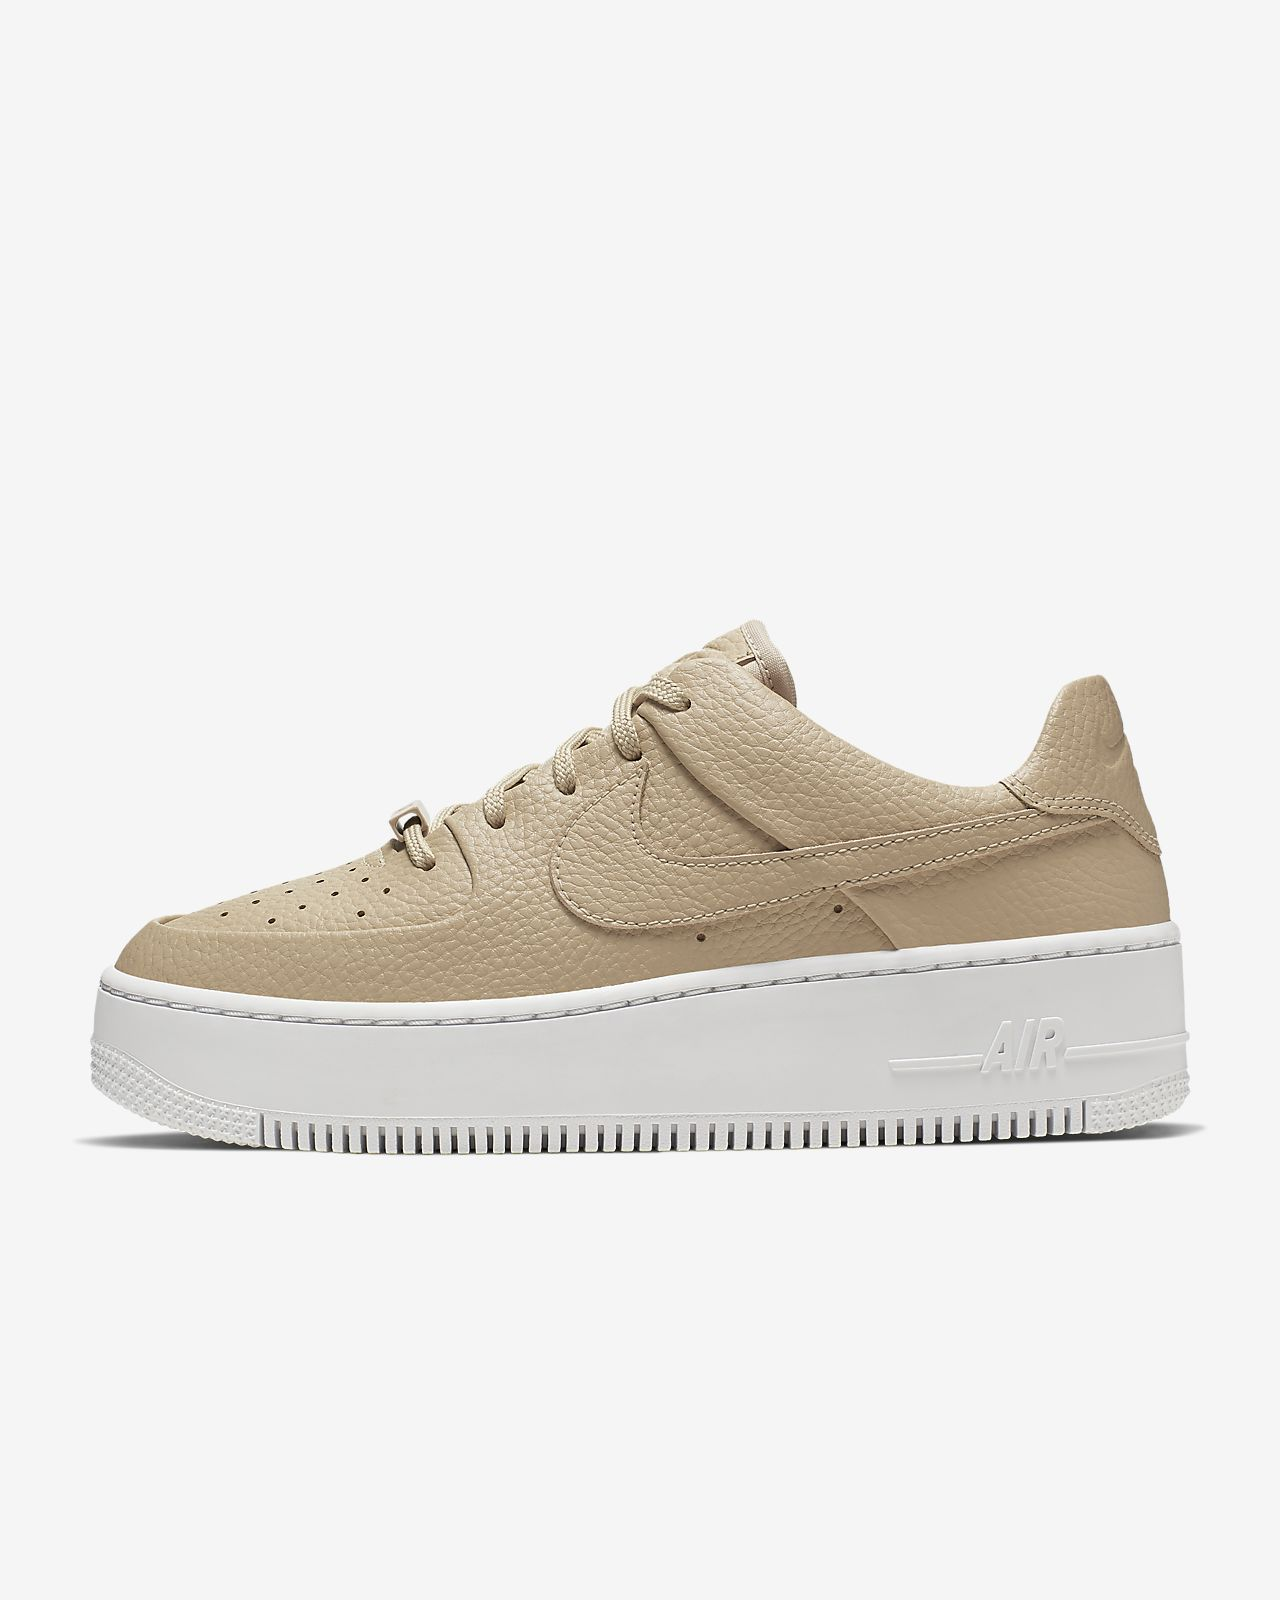 Skon Nike Air Force 1 Sage Low 2 för kvinnor